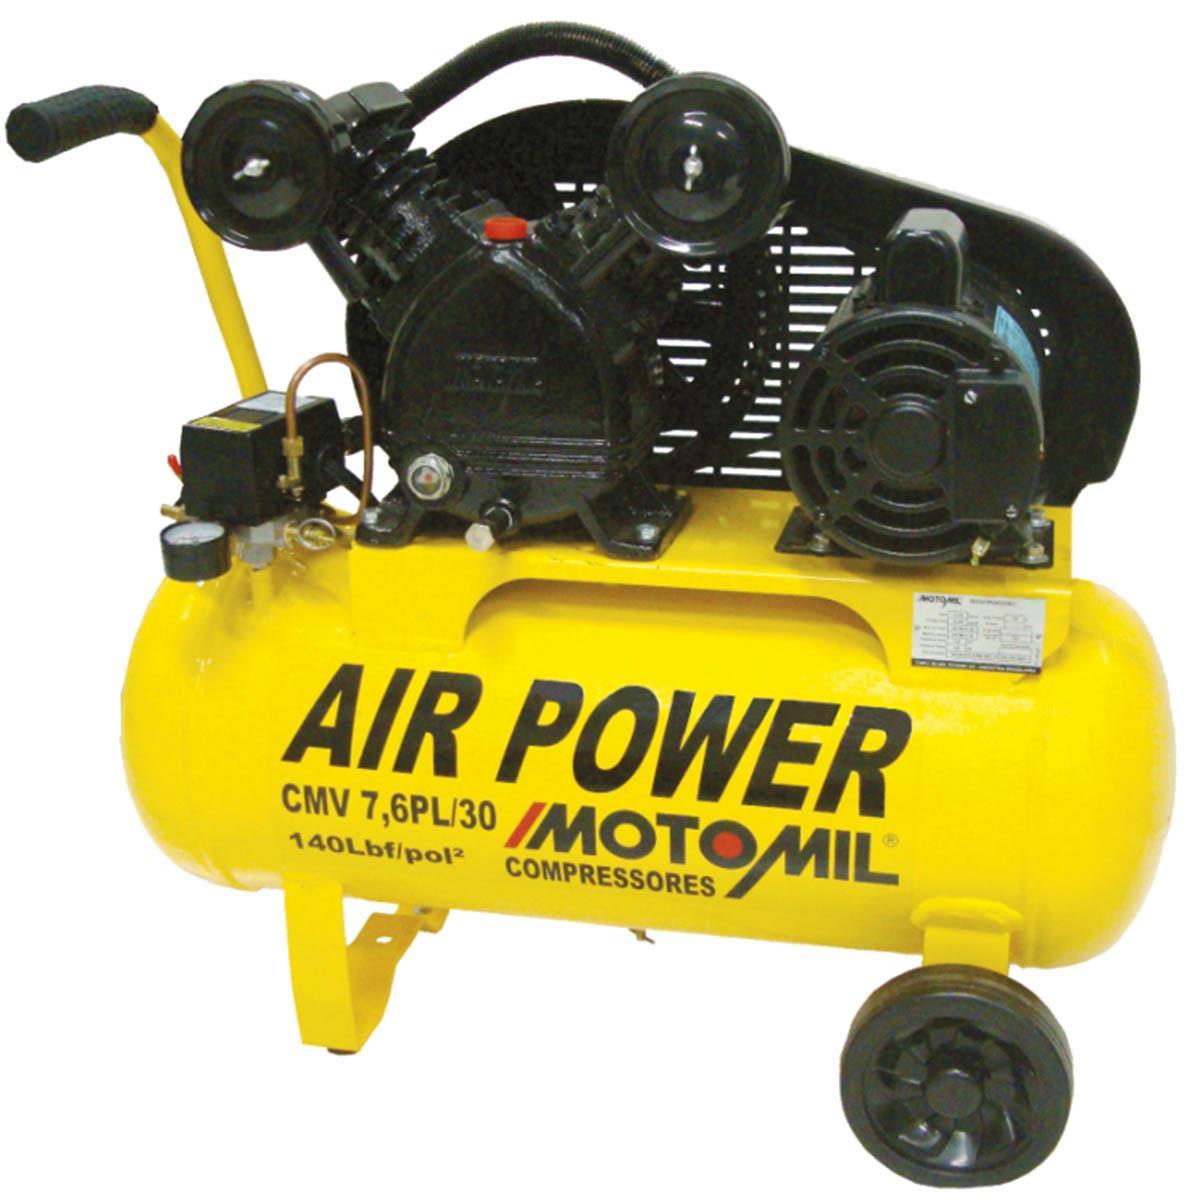 Compressor De Ar 1Hp Monofásico 110 / 220Volts Cmv - 7.6Pl / 30 Motomil